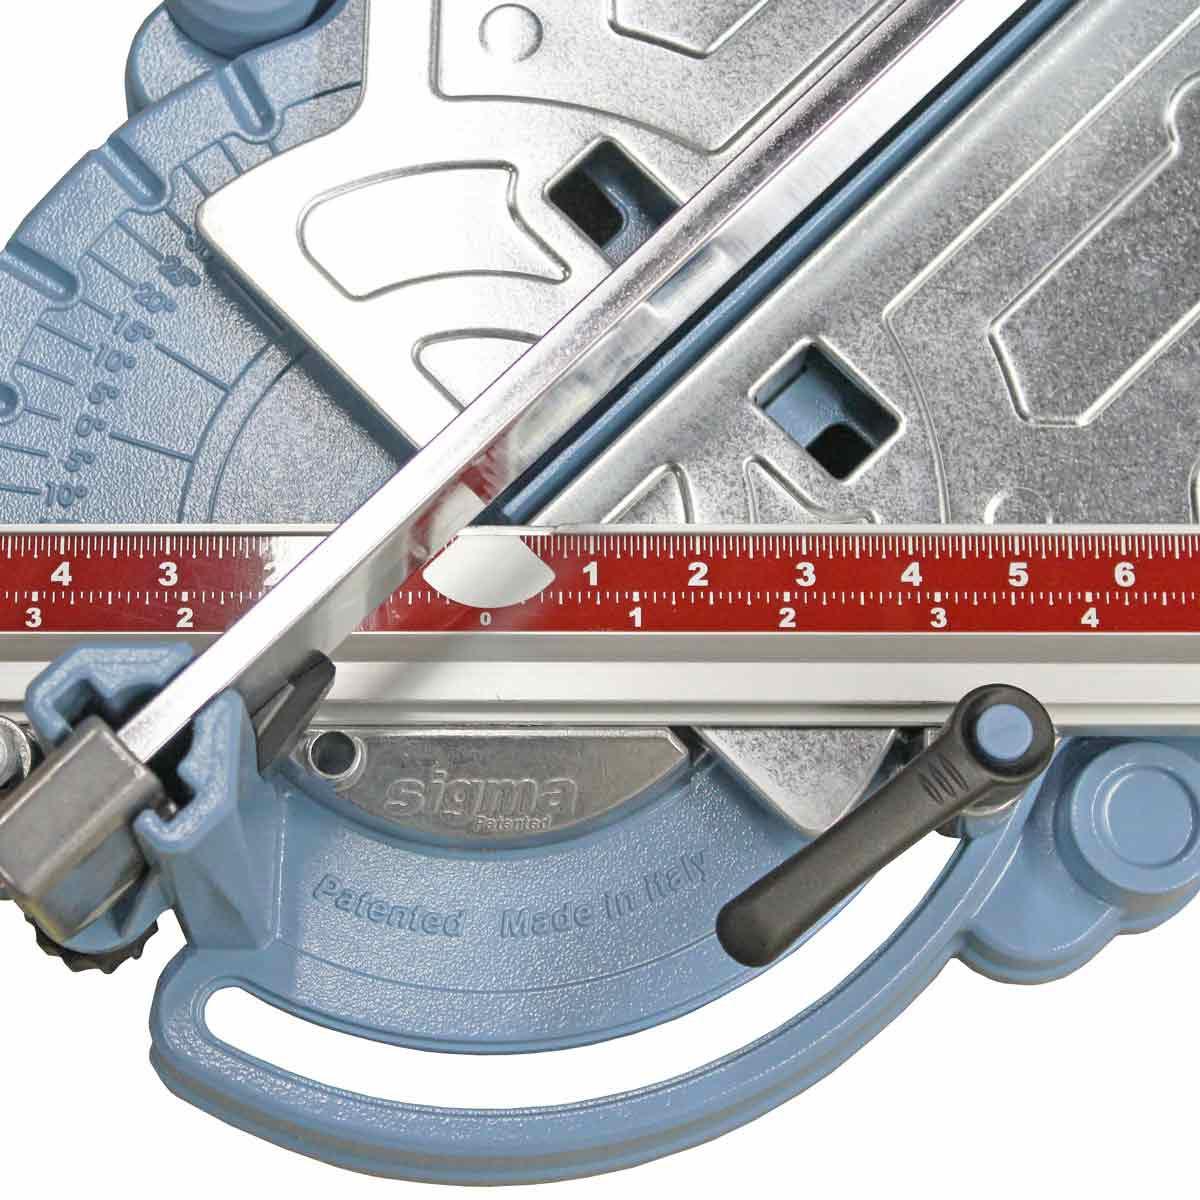 Sigma Tile Cutter 3C2